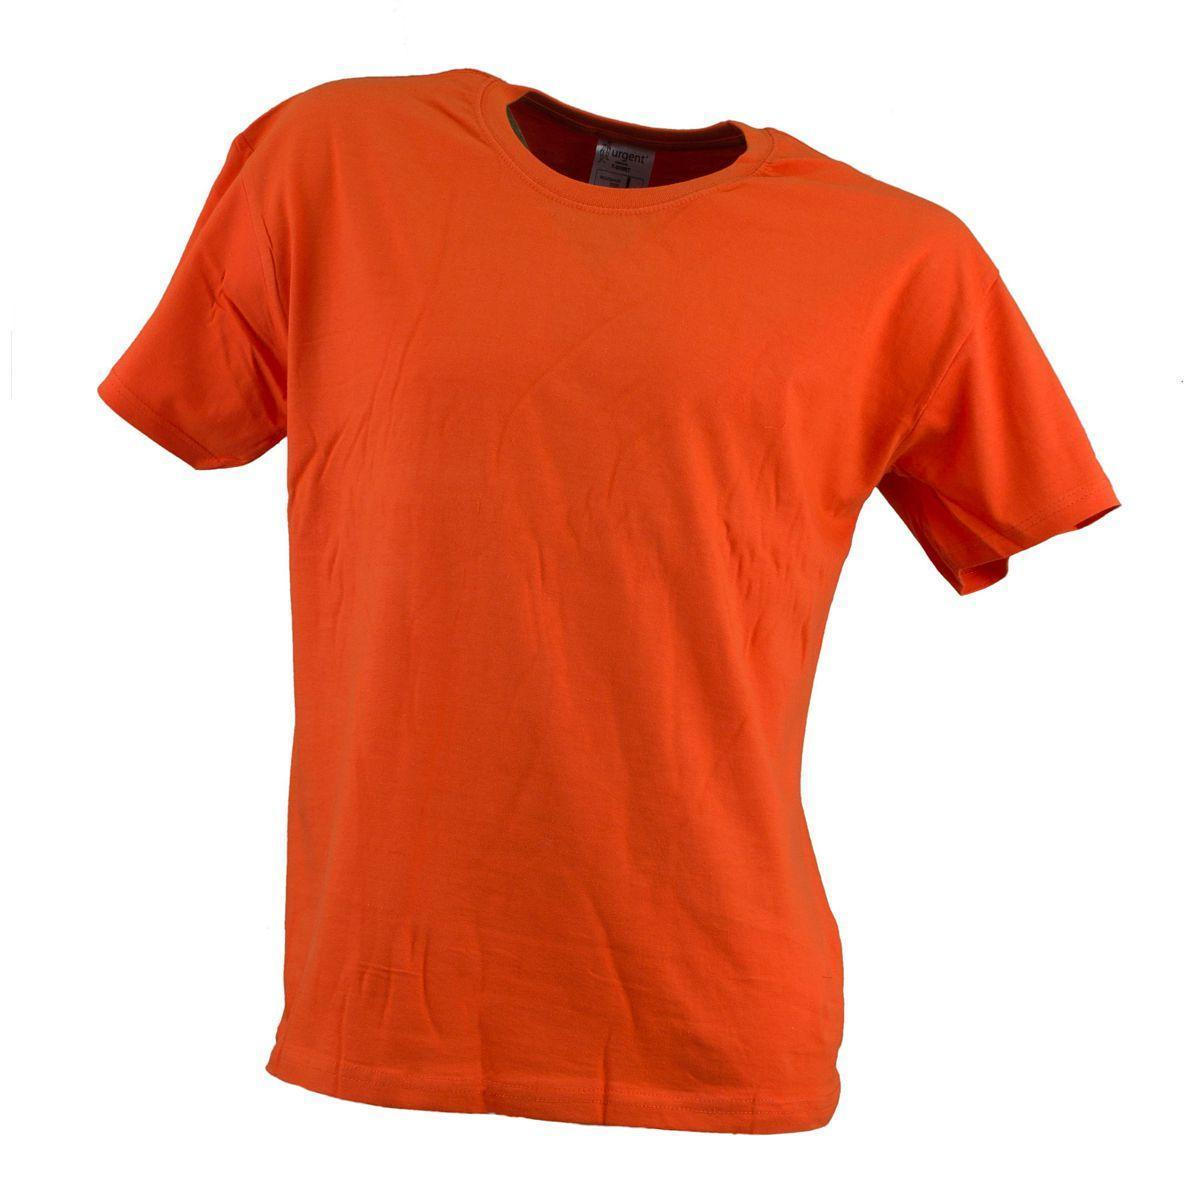 Футболка T-SHIRT MĘSKI POMARAŃCZ 180g плотностью 180g, оранжевого цвета.  Urgent (POLAND)